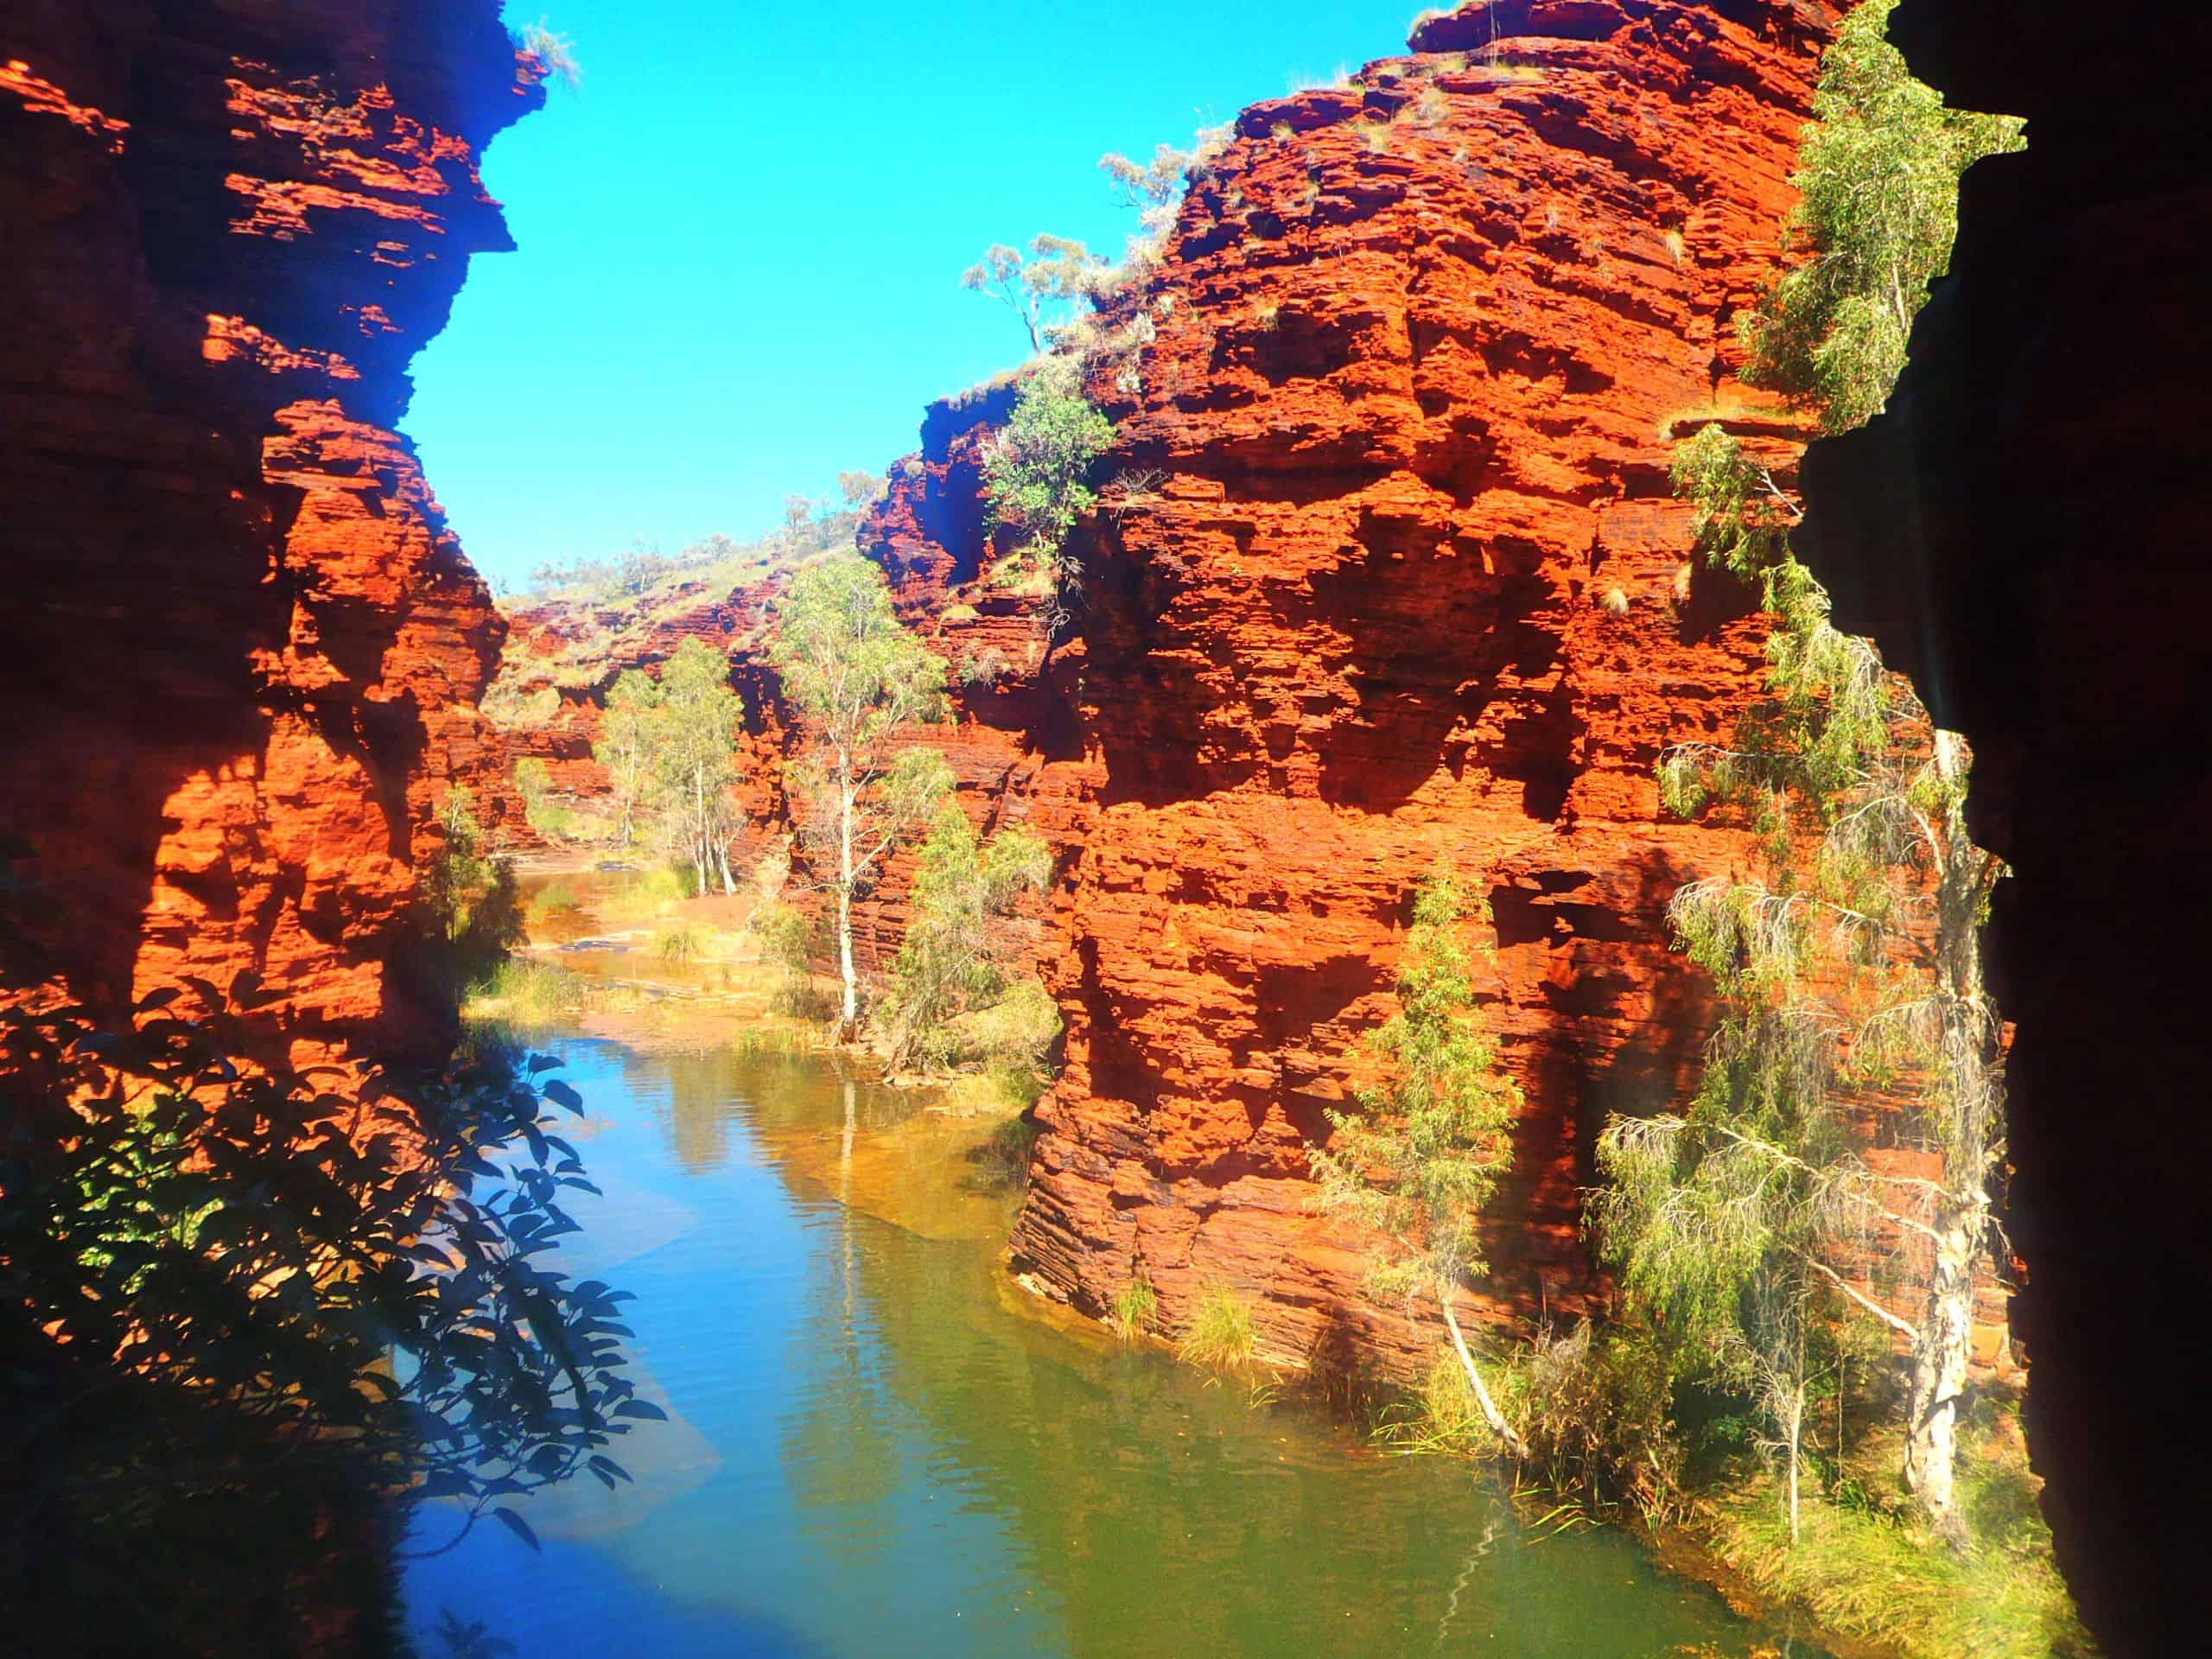 le parc national Karijiri en Australie